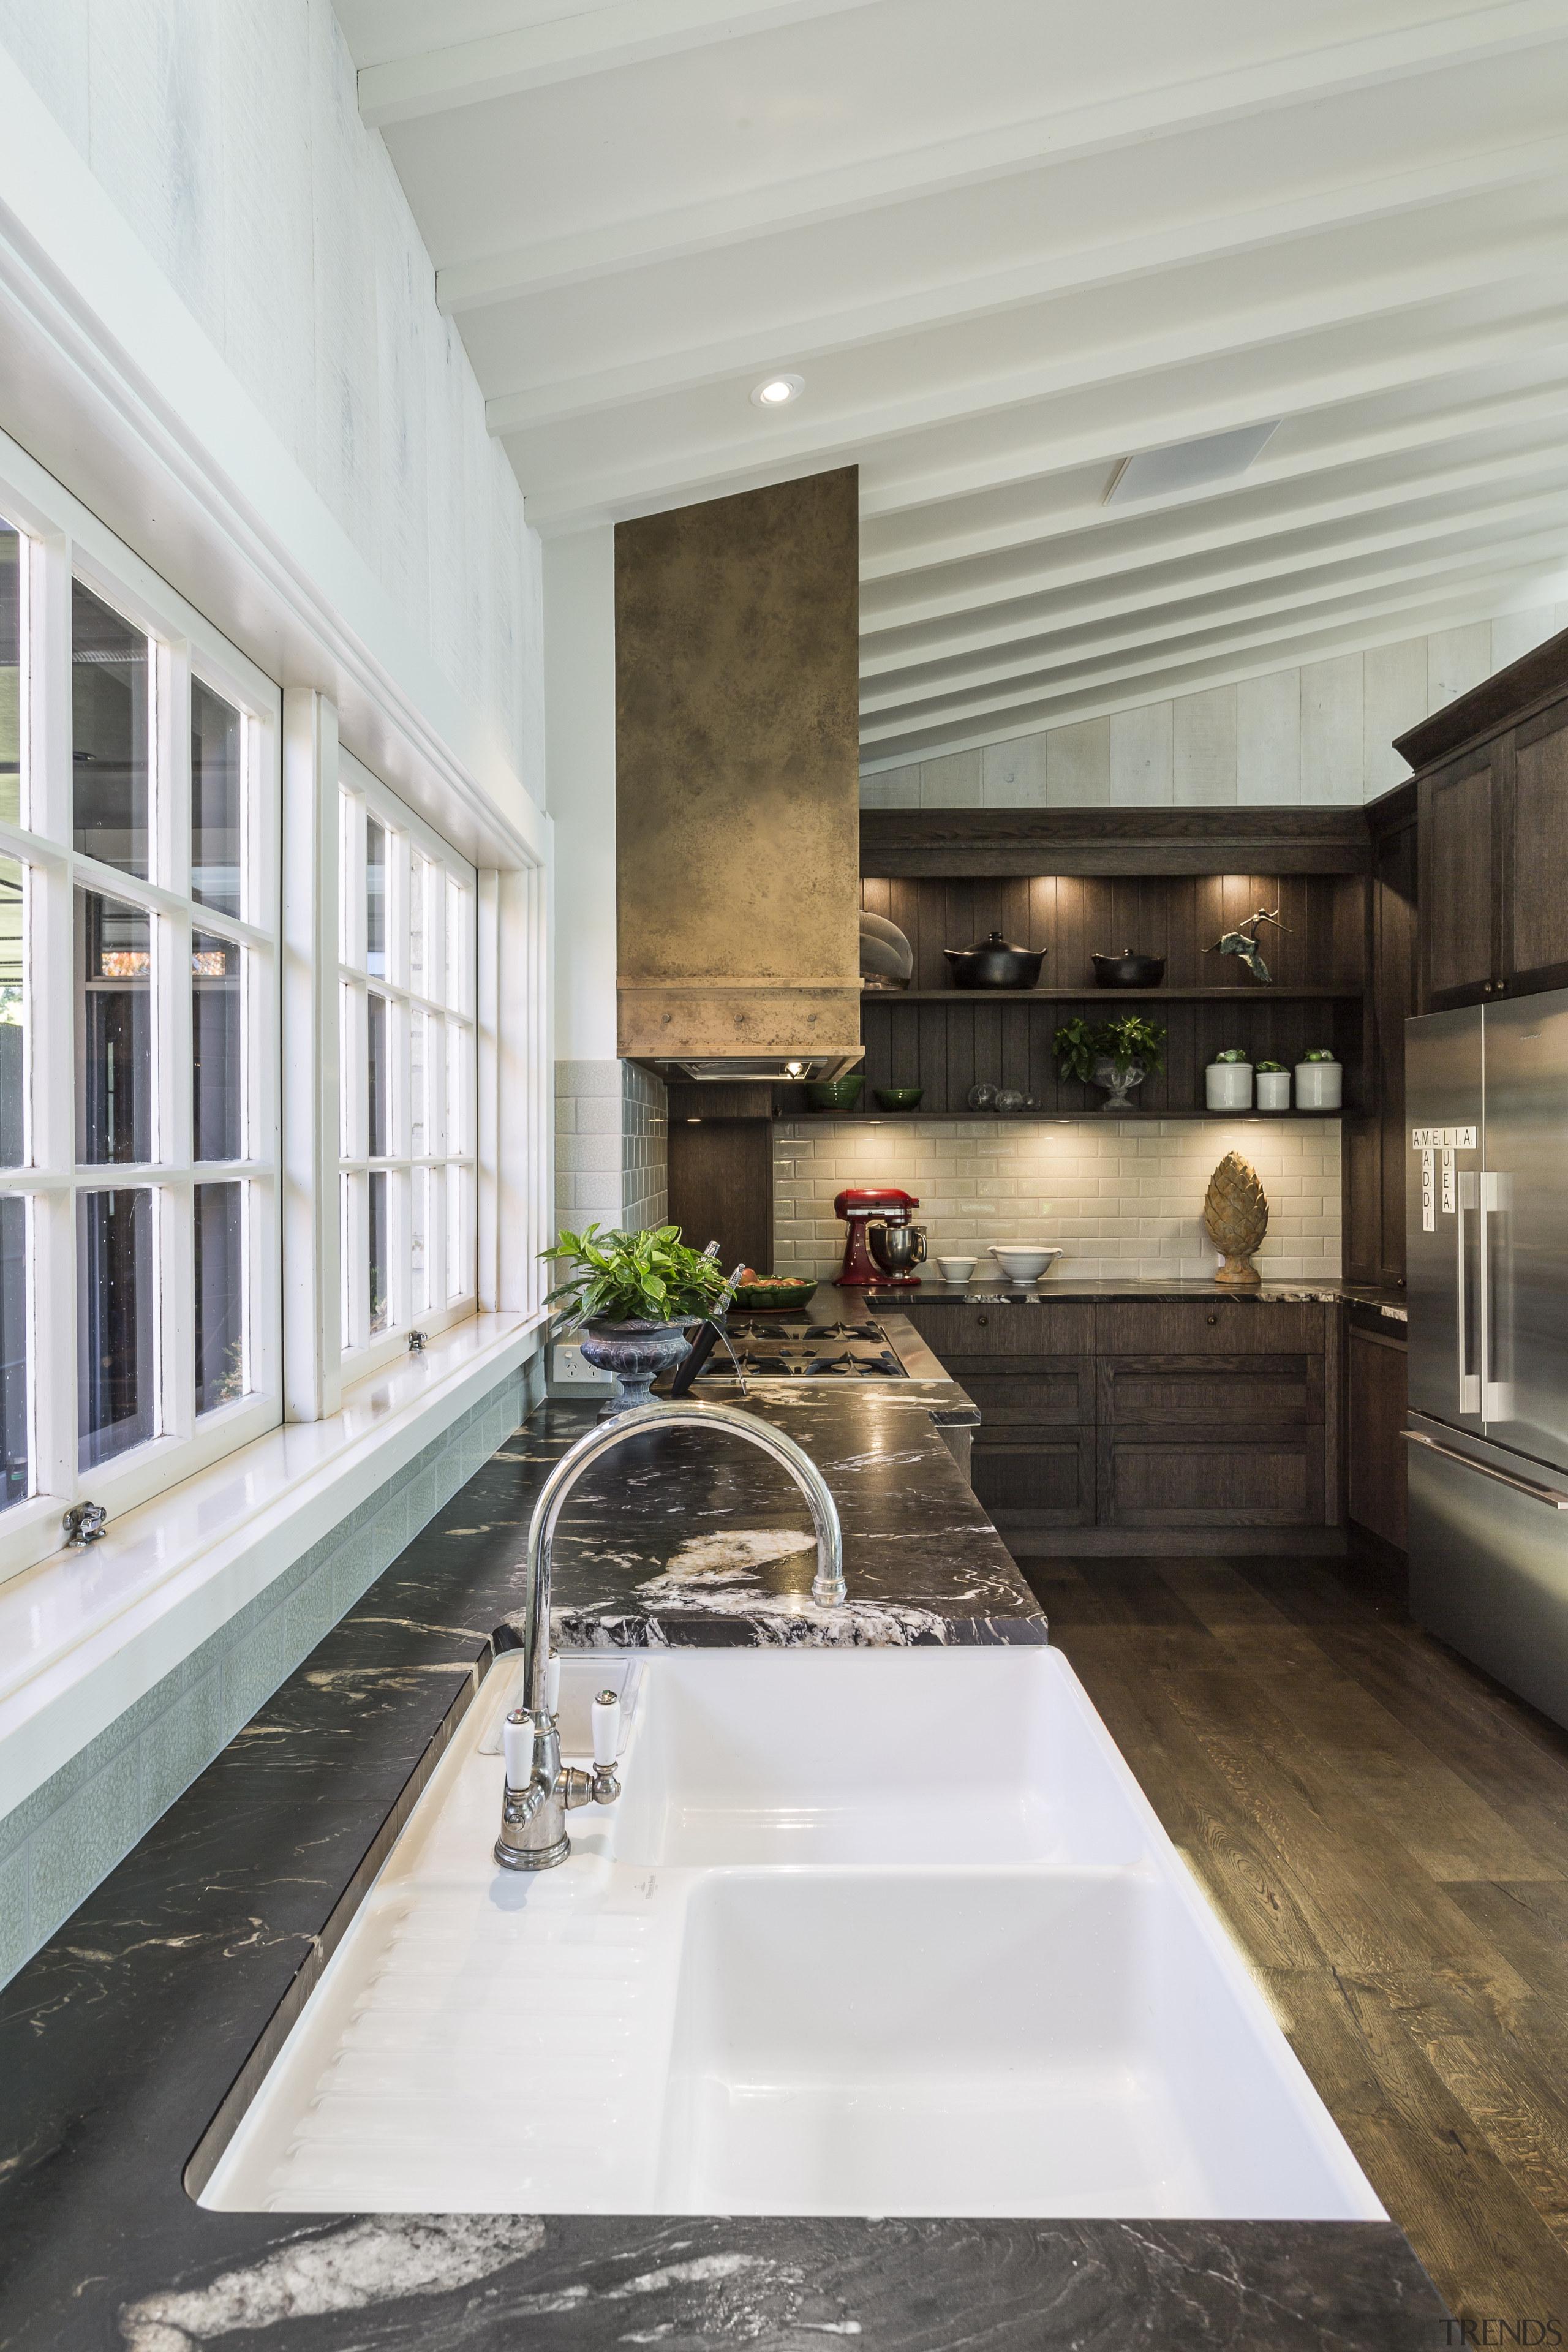 This kitchen by designer Shane George of Kitchens gray, white